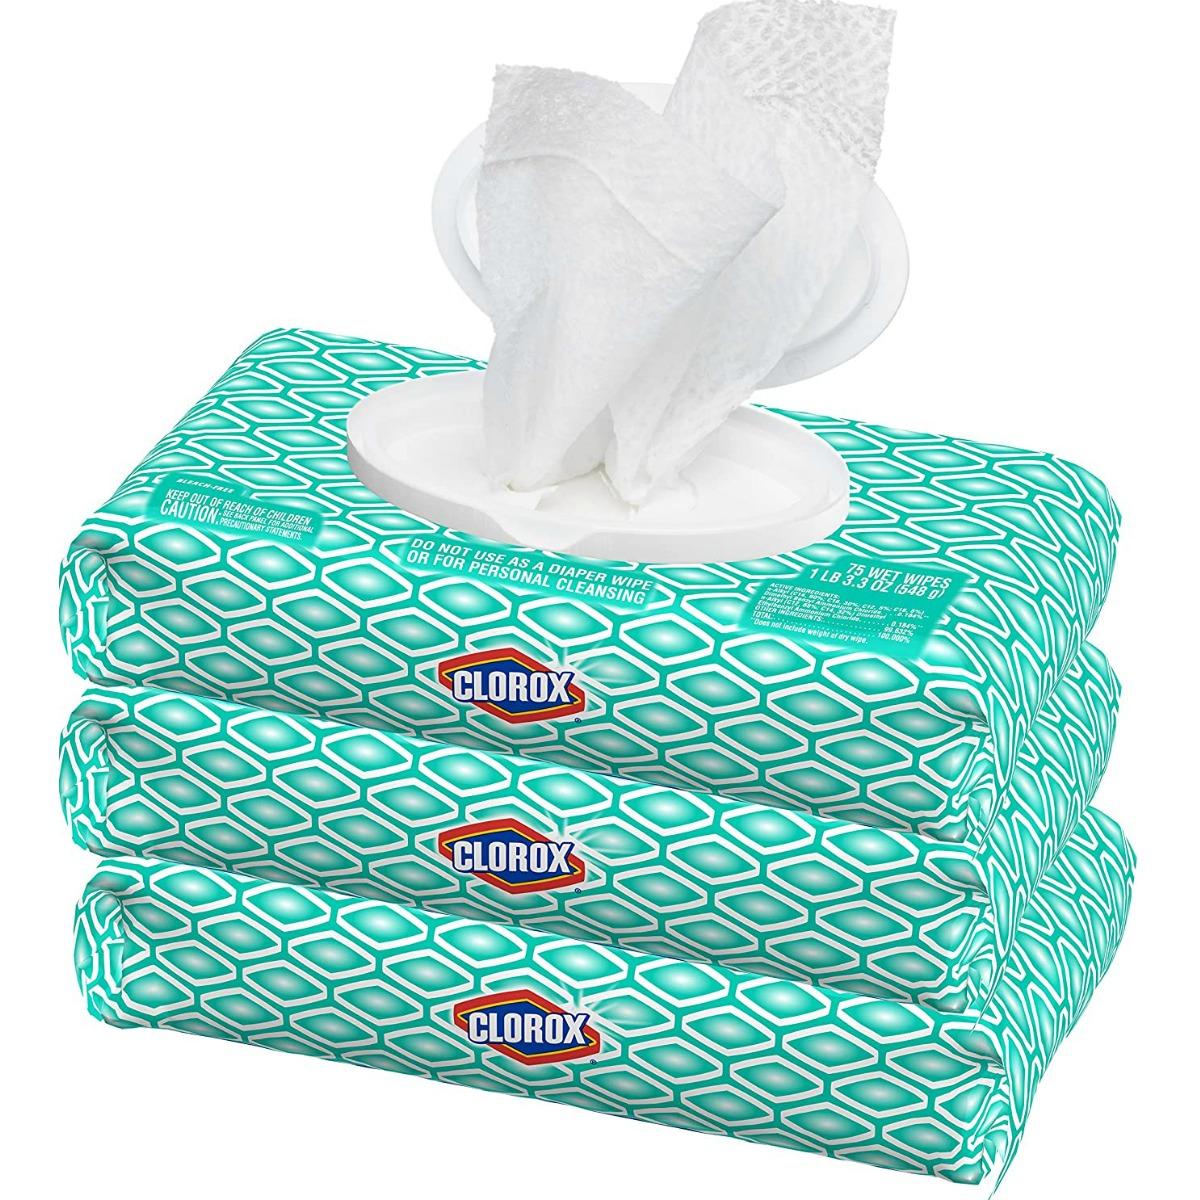 Stack of Clorox wipes packs